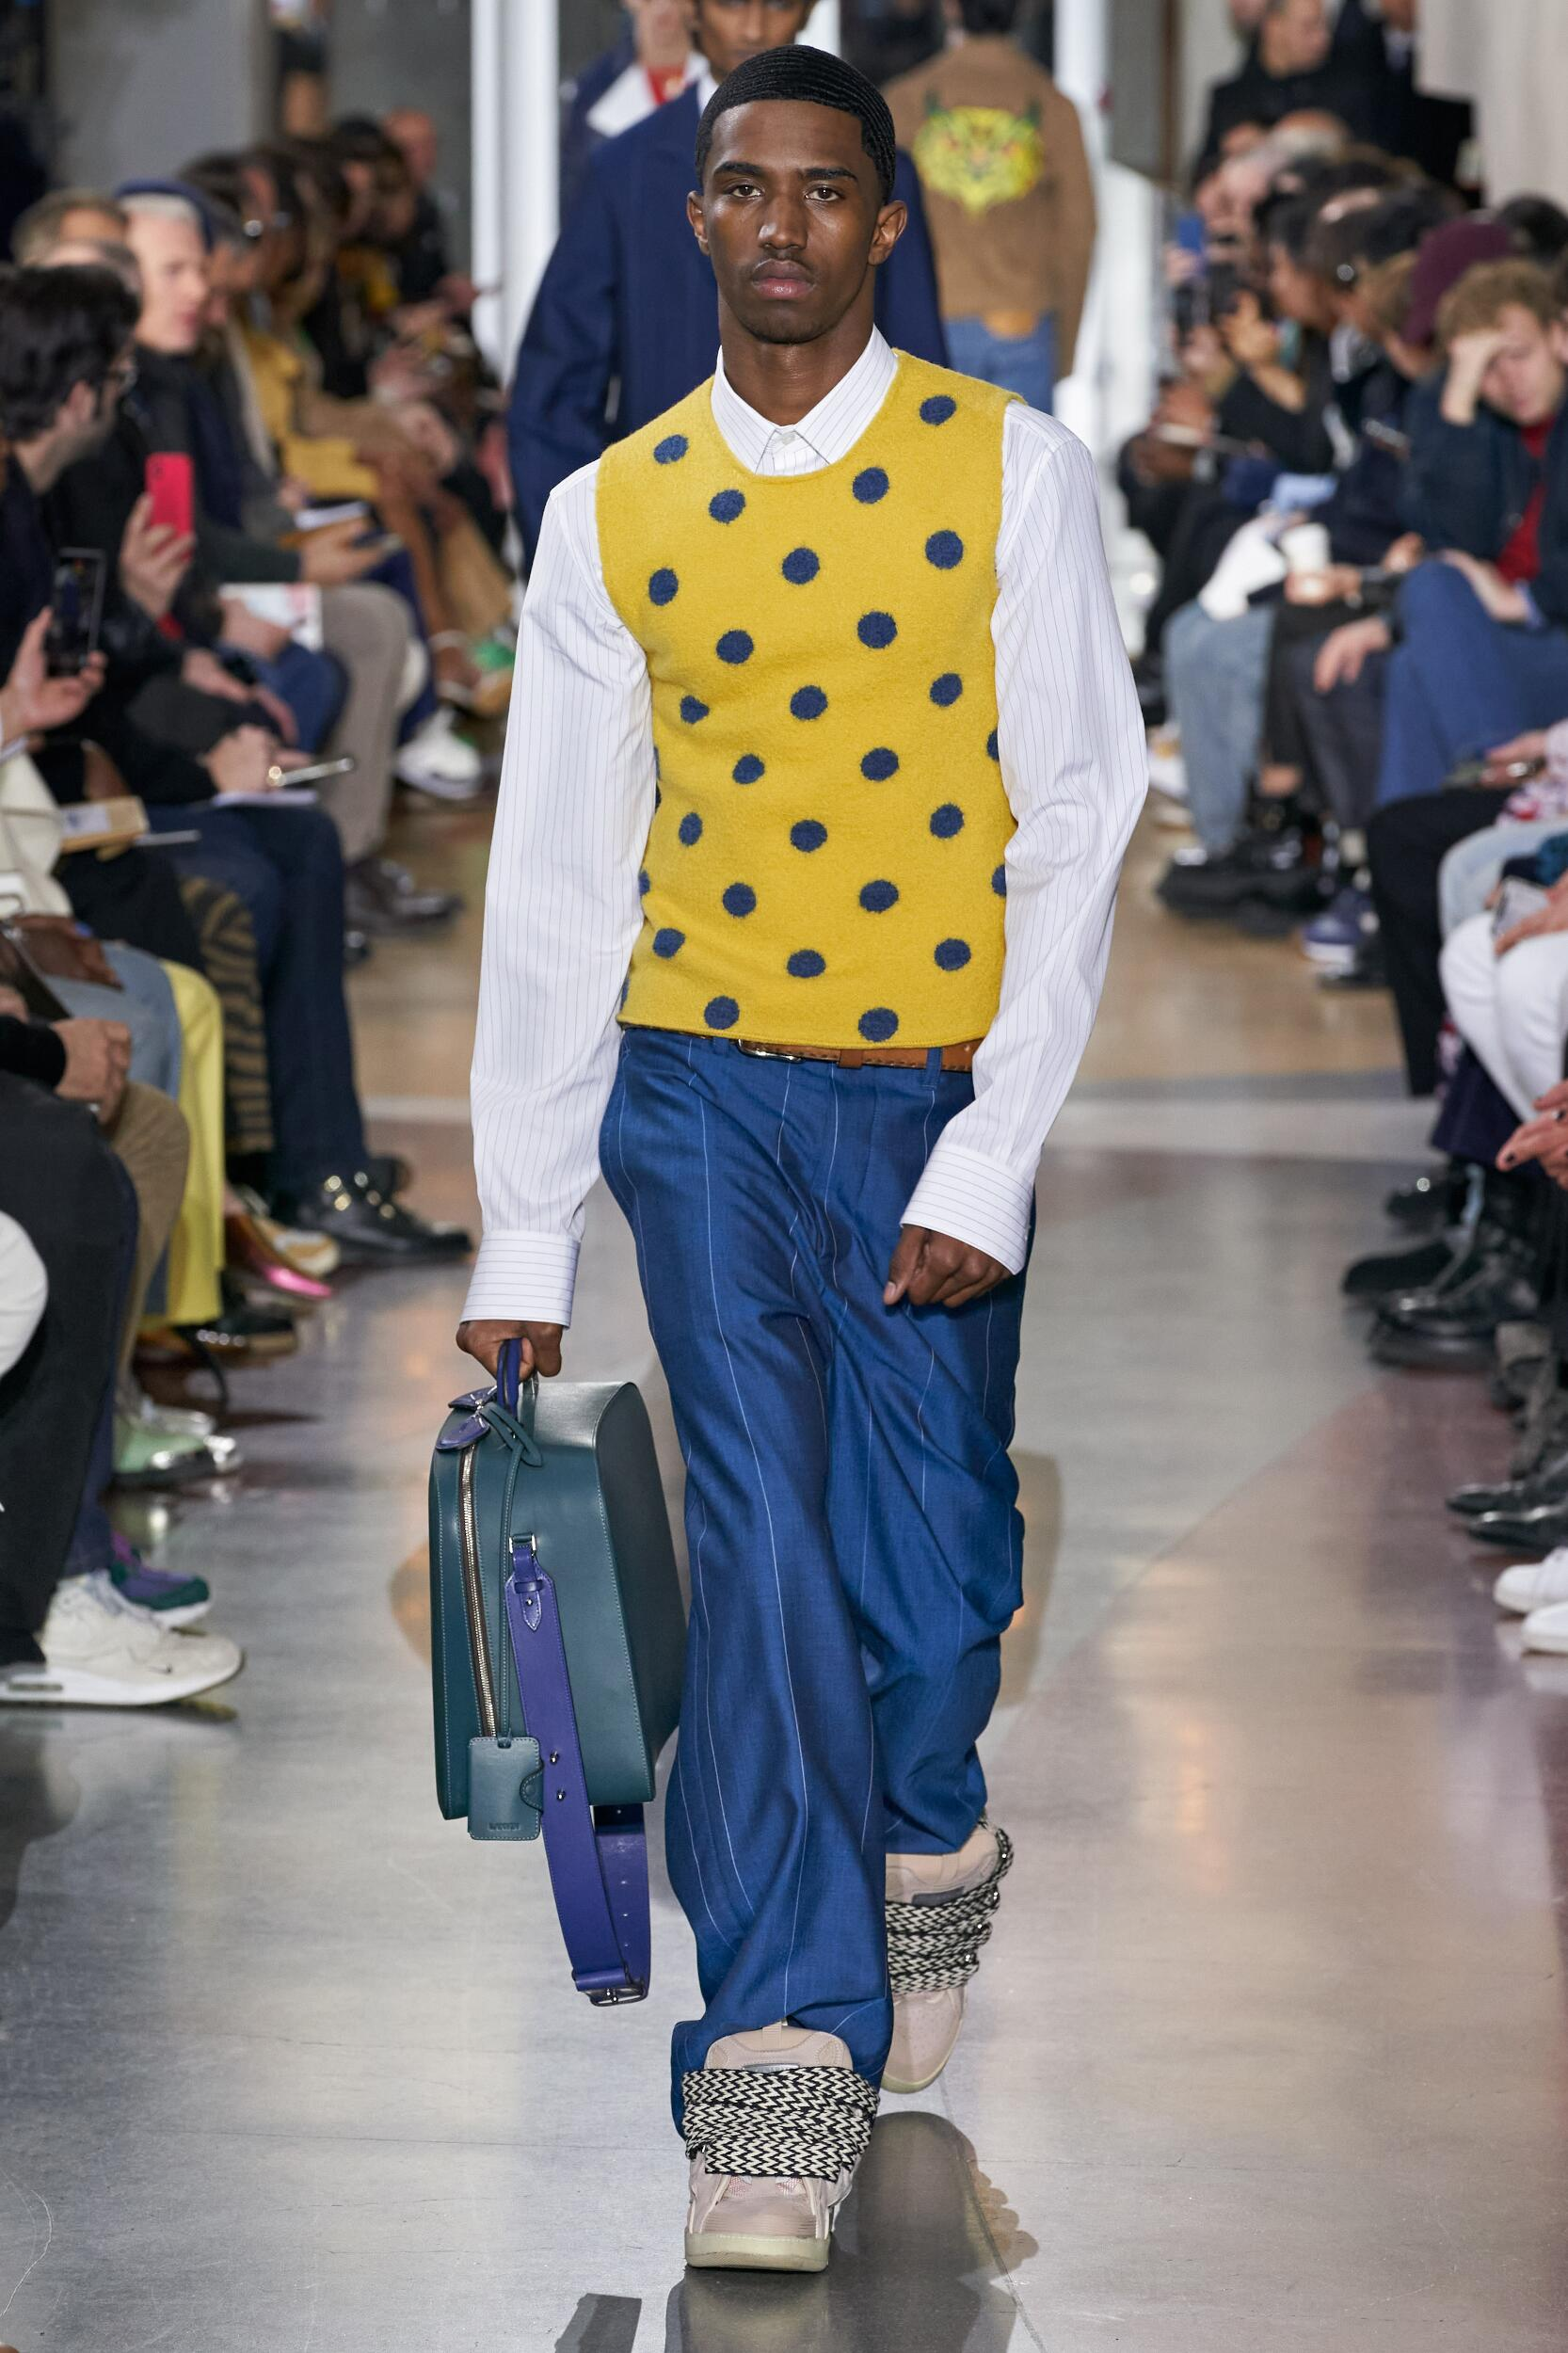 Catwalk Lanvin Man Fashion Show Winter 2020